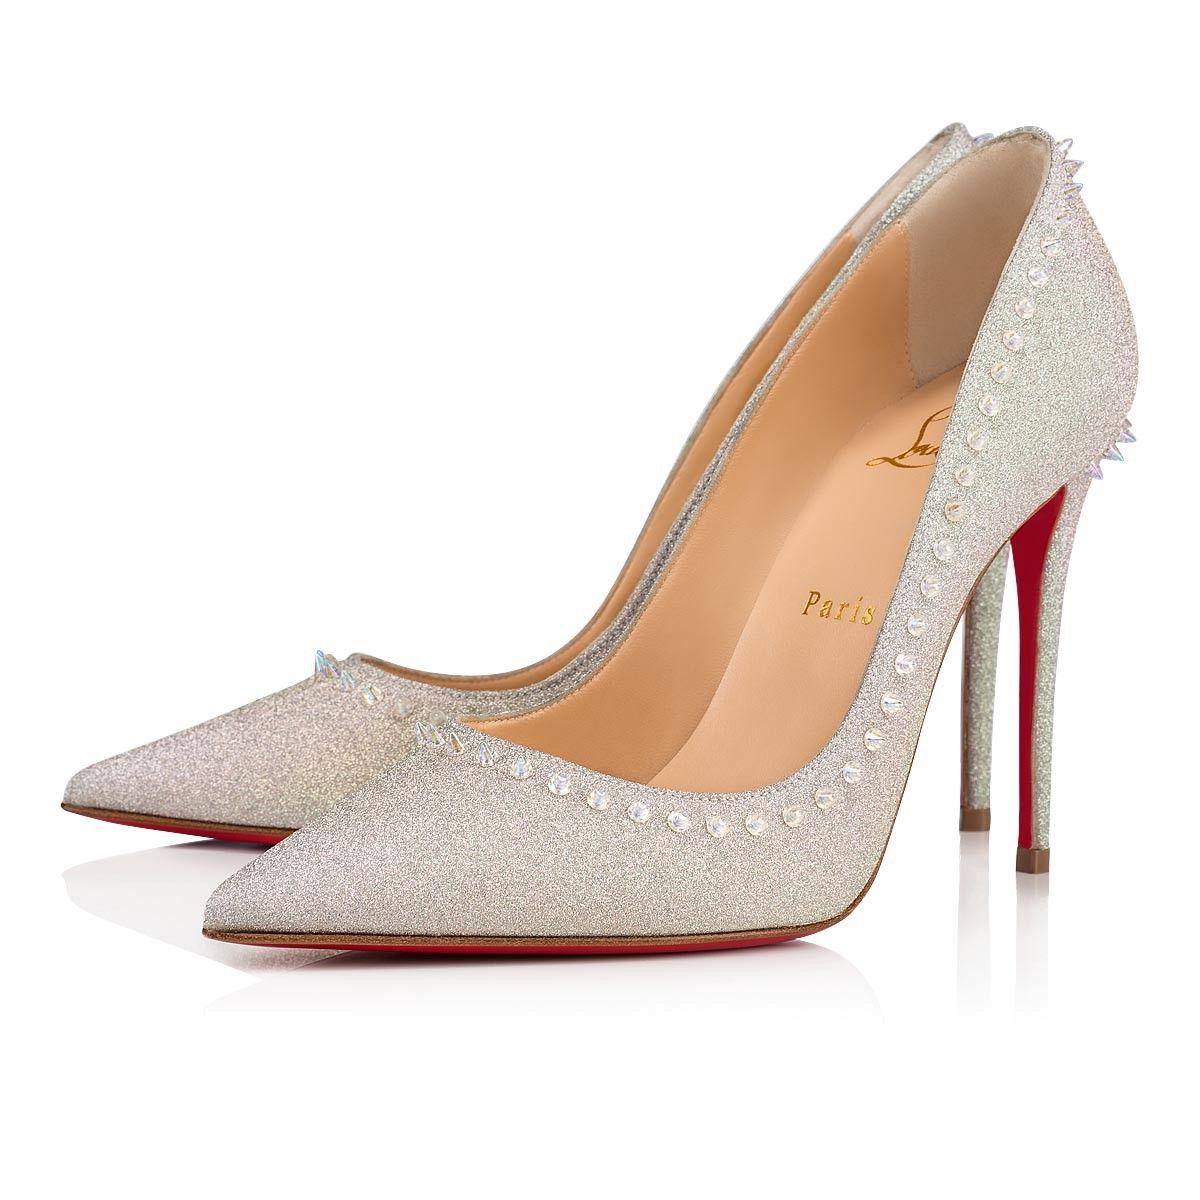 6d23fbc4ea9 Anjalina 100 Ab Glitter Sunset - Women Shoes - Christian Louboutin ...